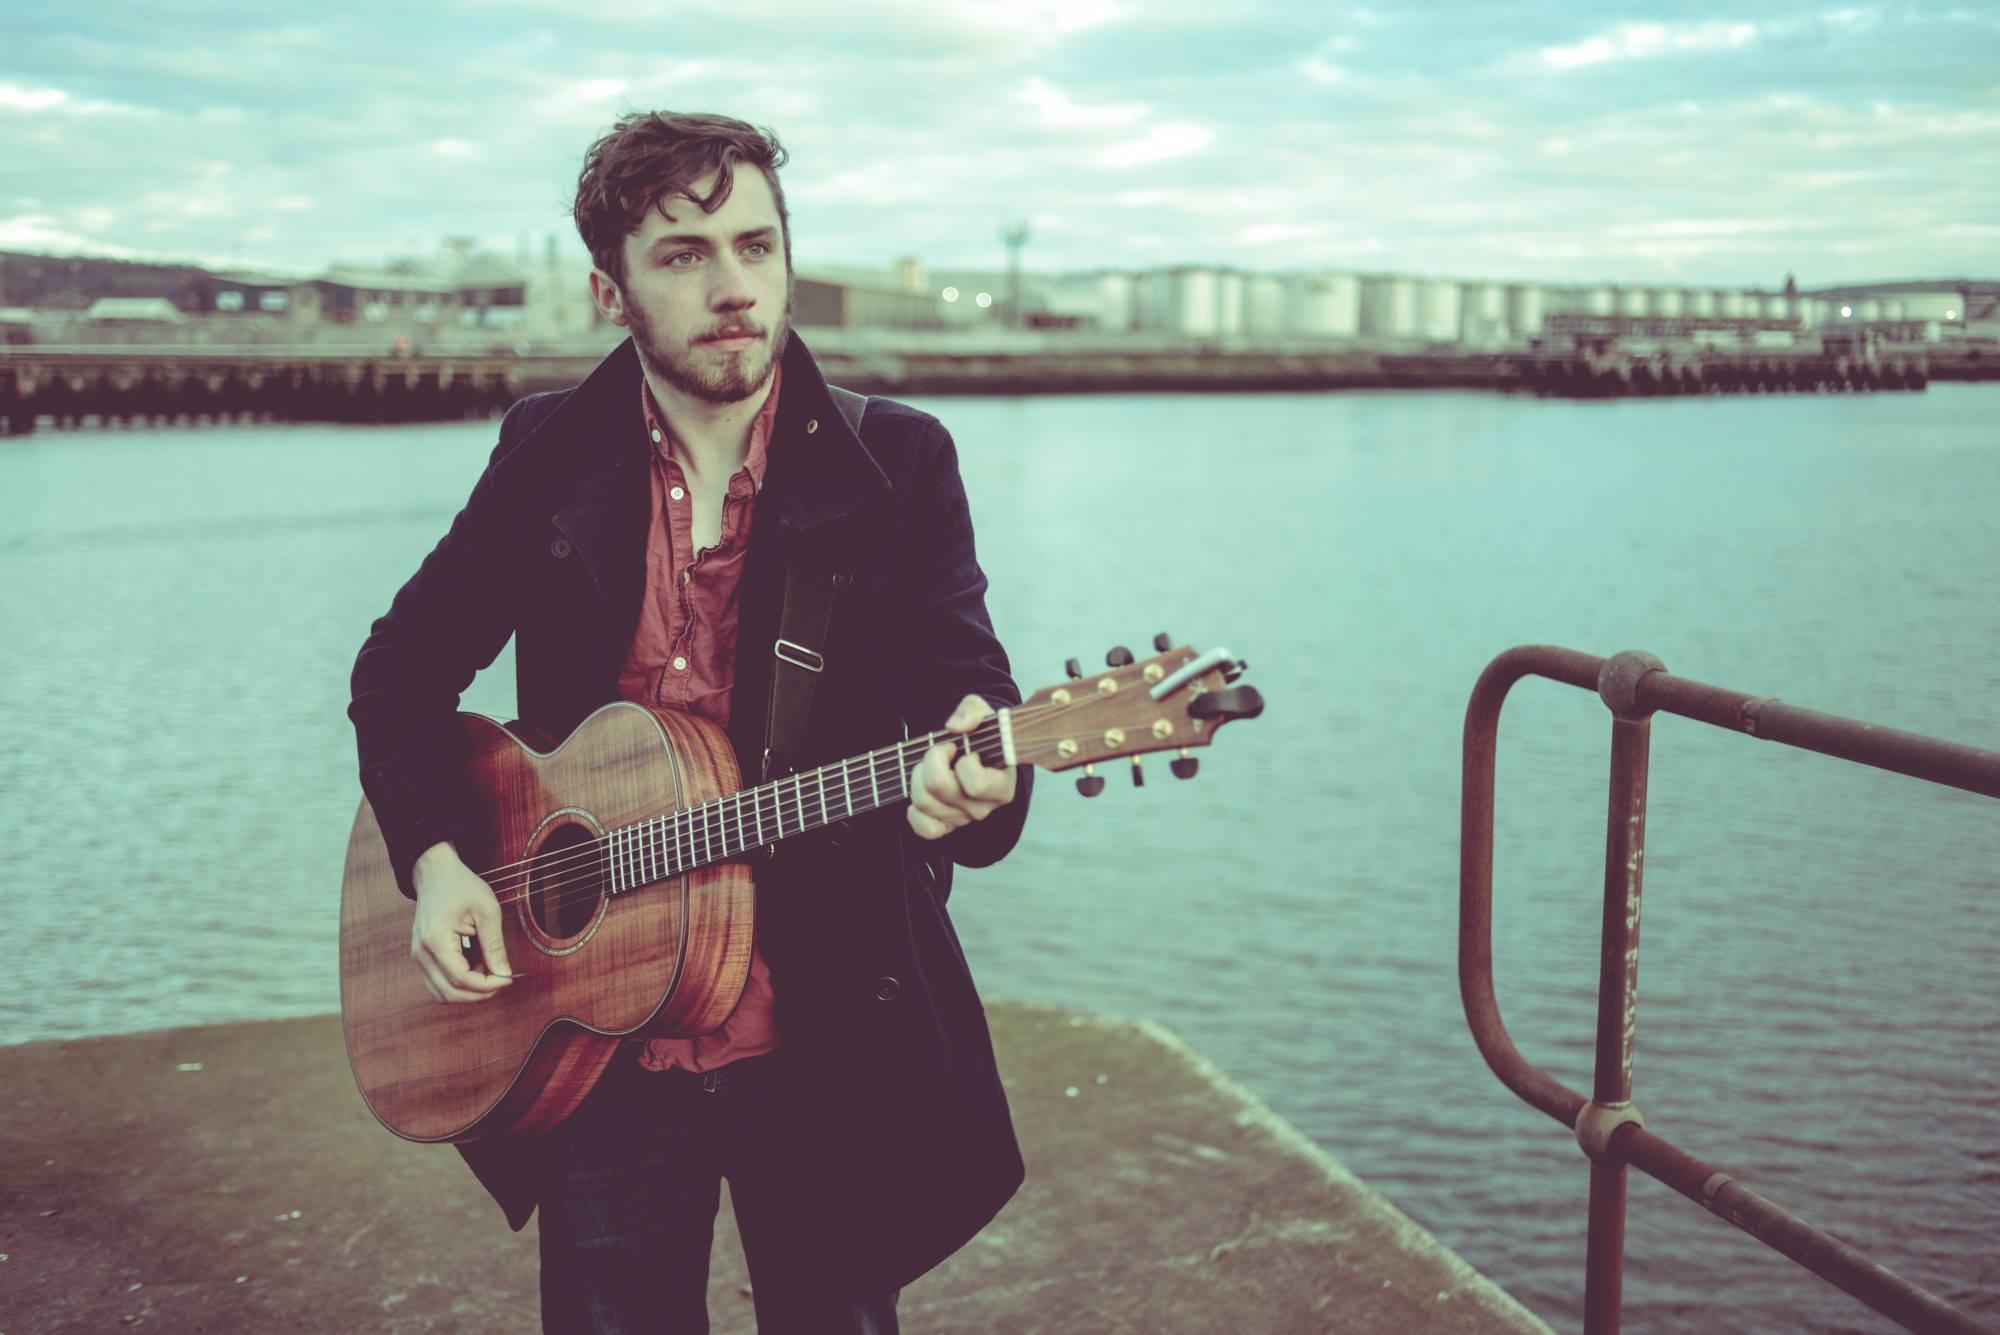 Owen McGarry at Red Star Music Ballymena